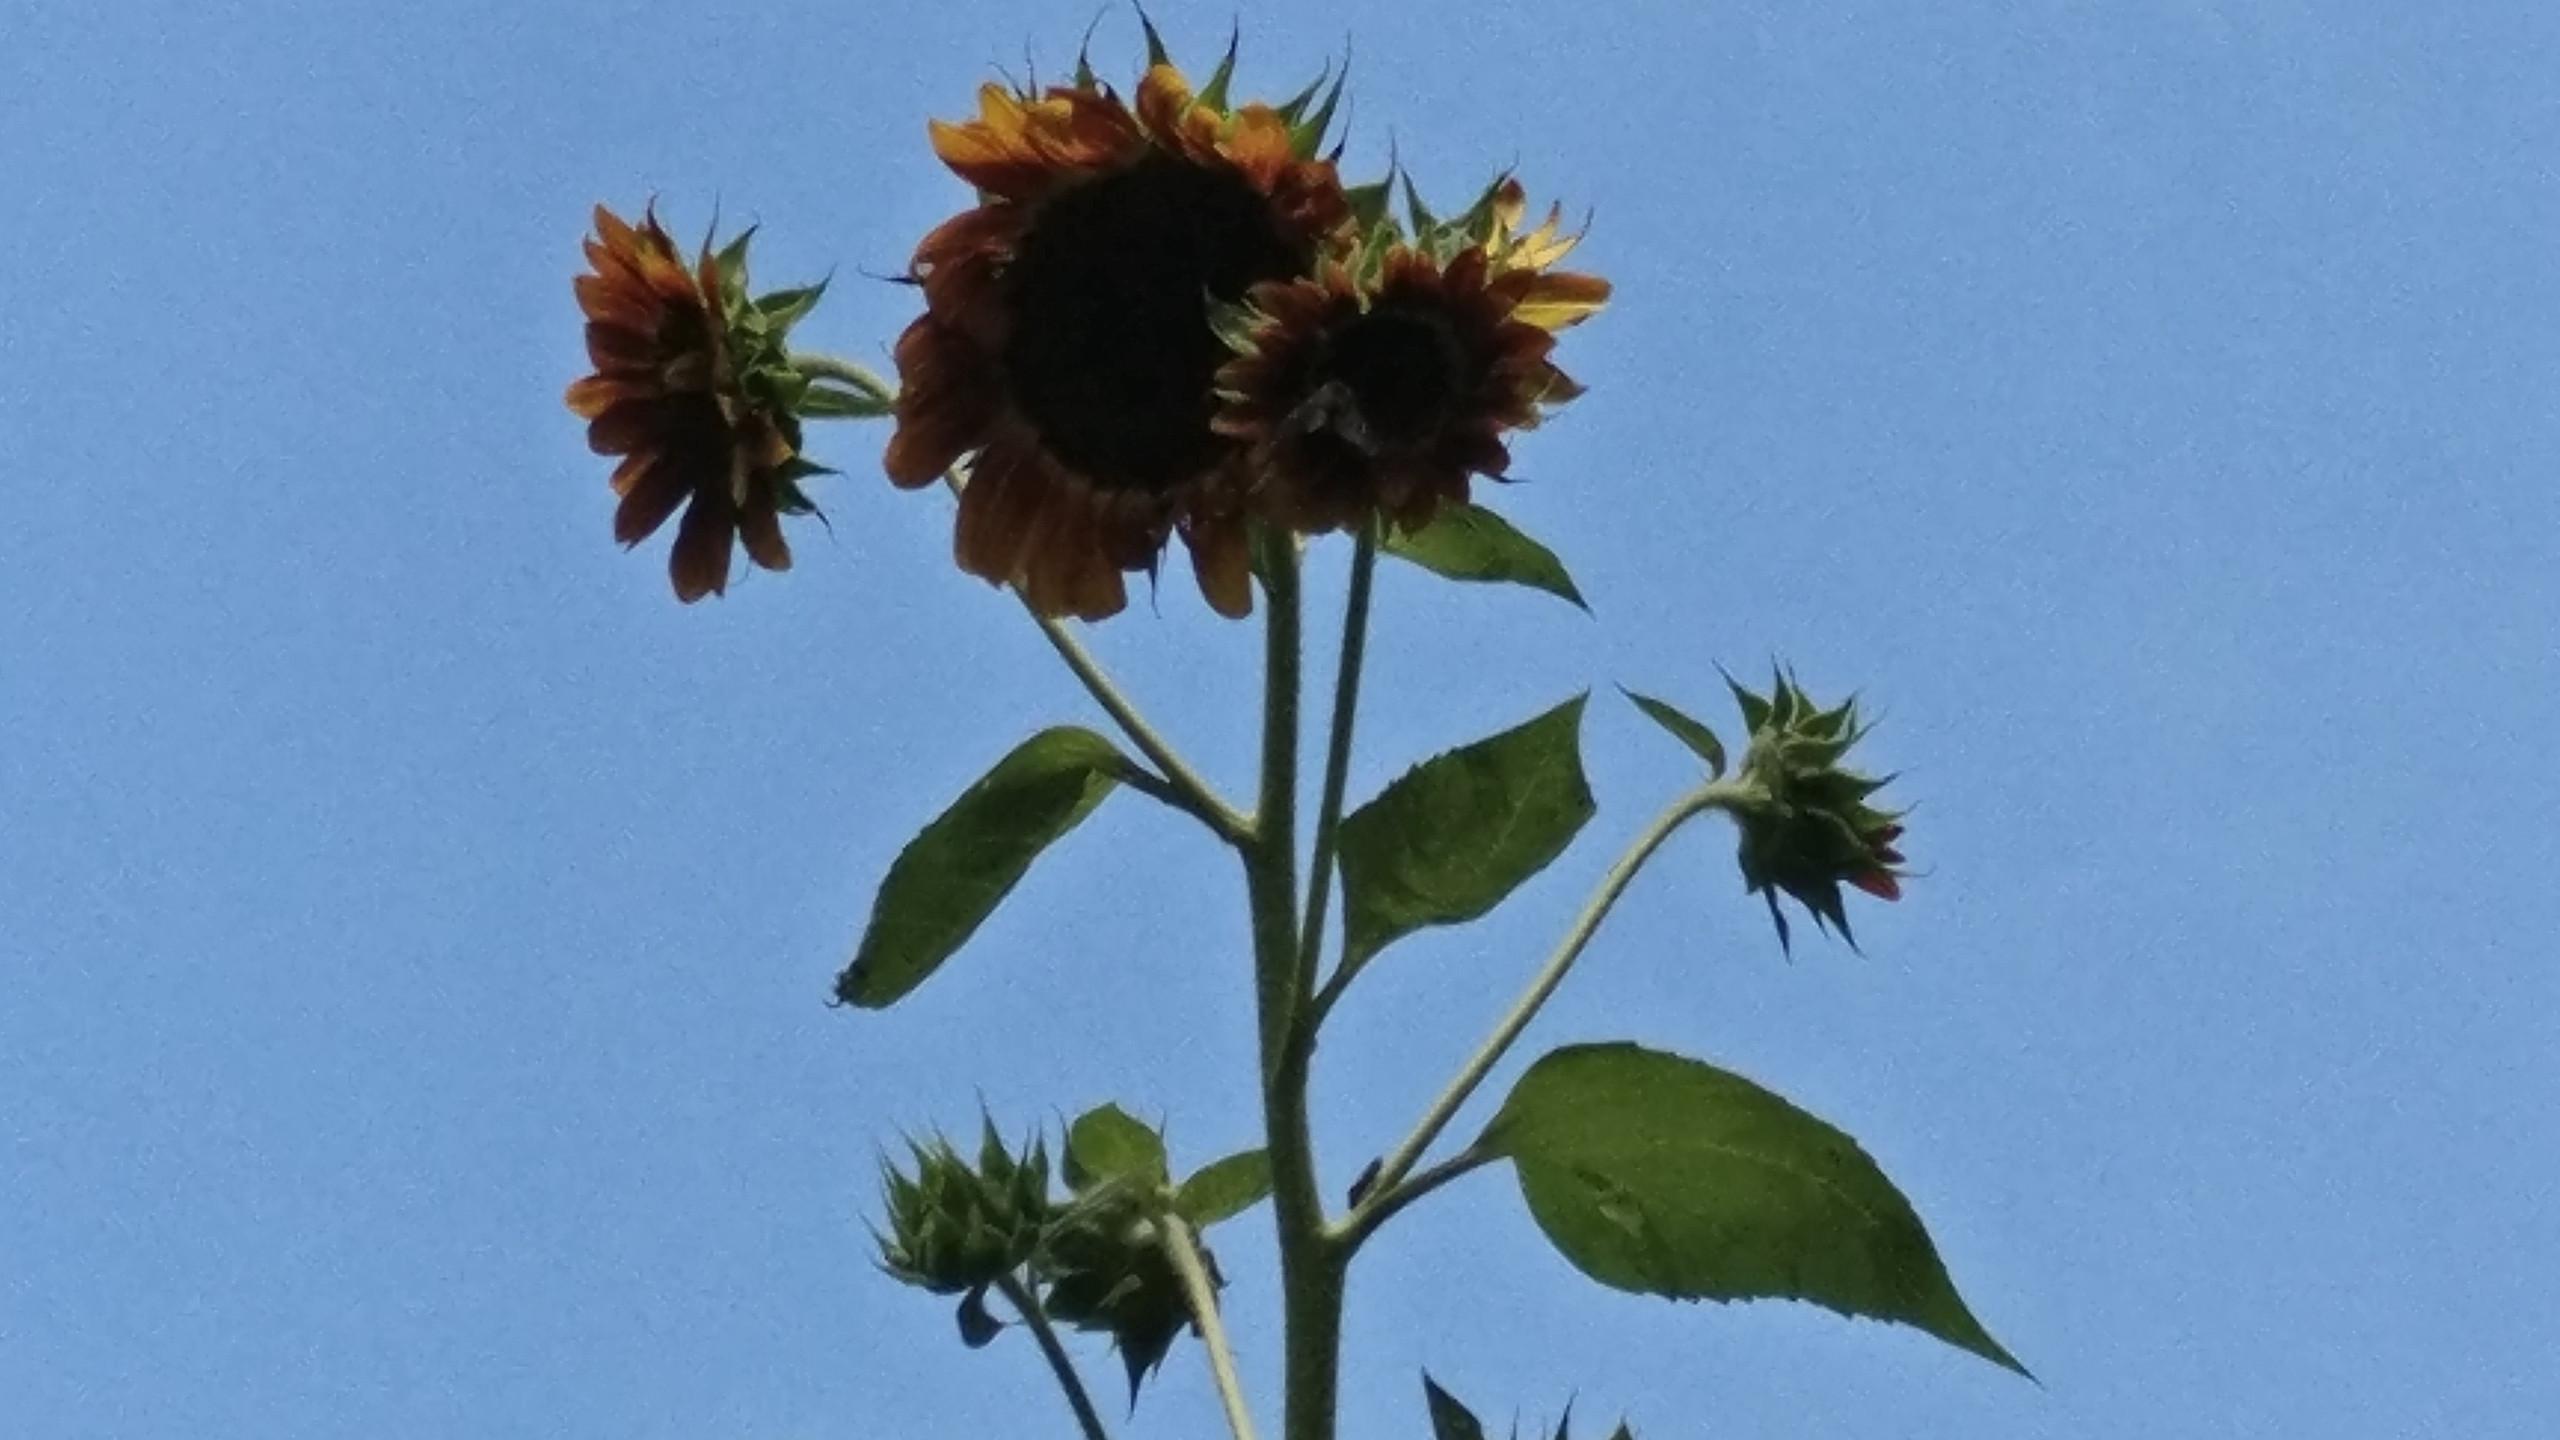 Sunflower Tower